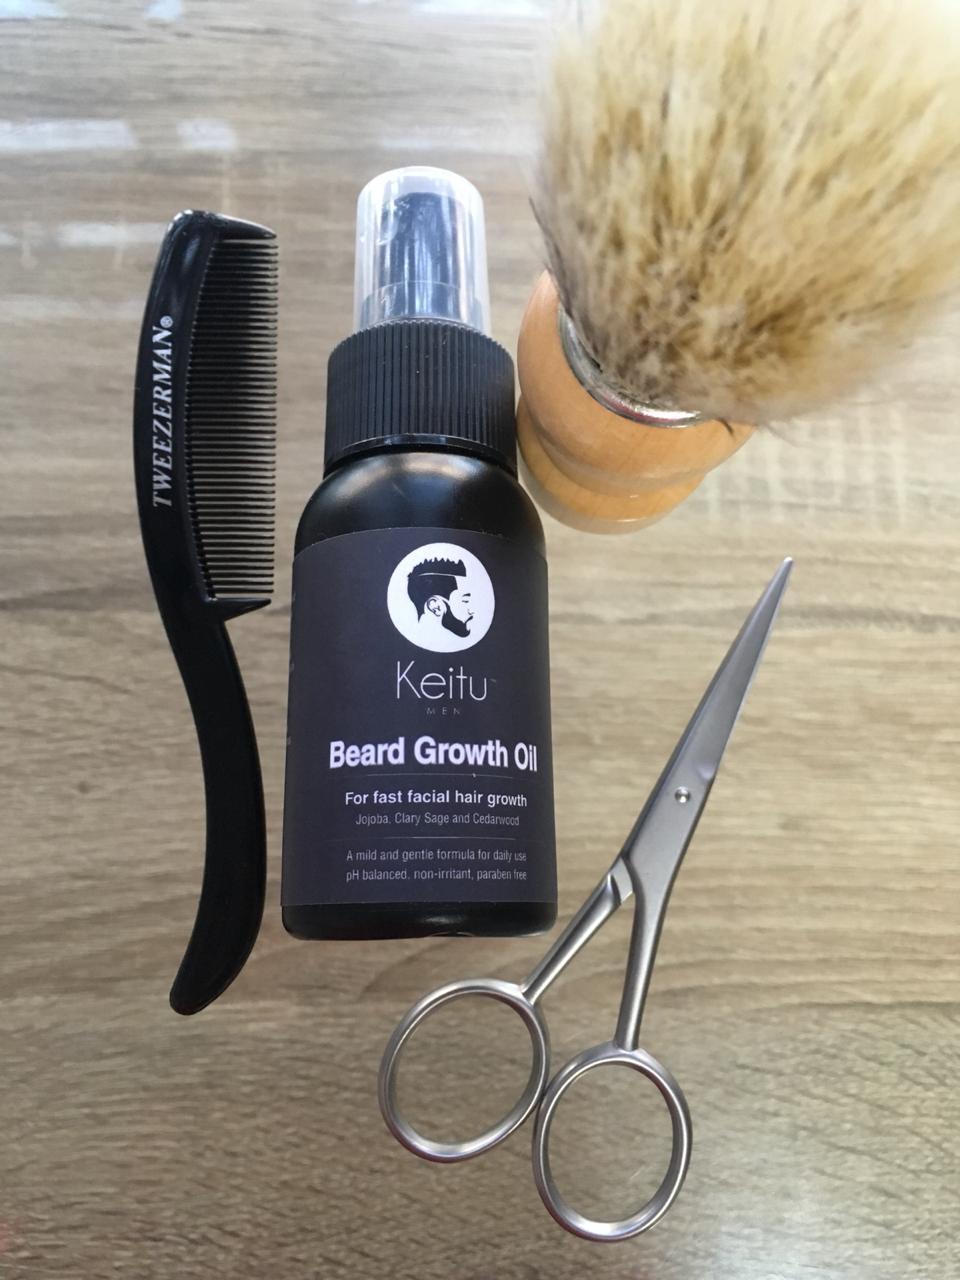 beared oil